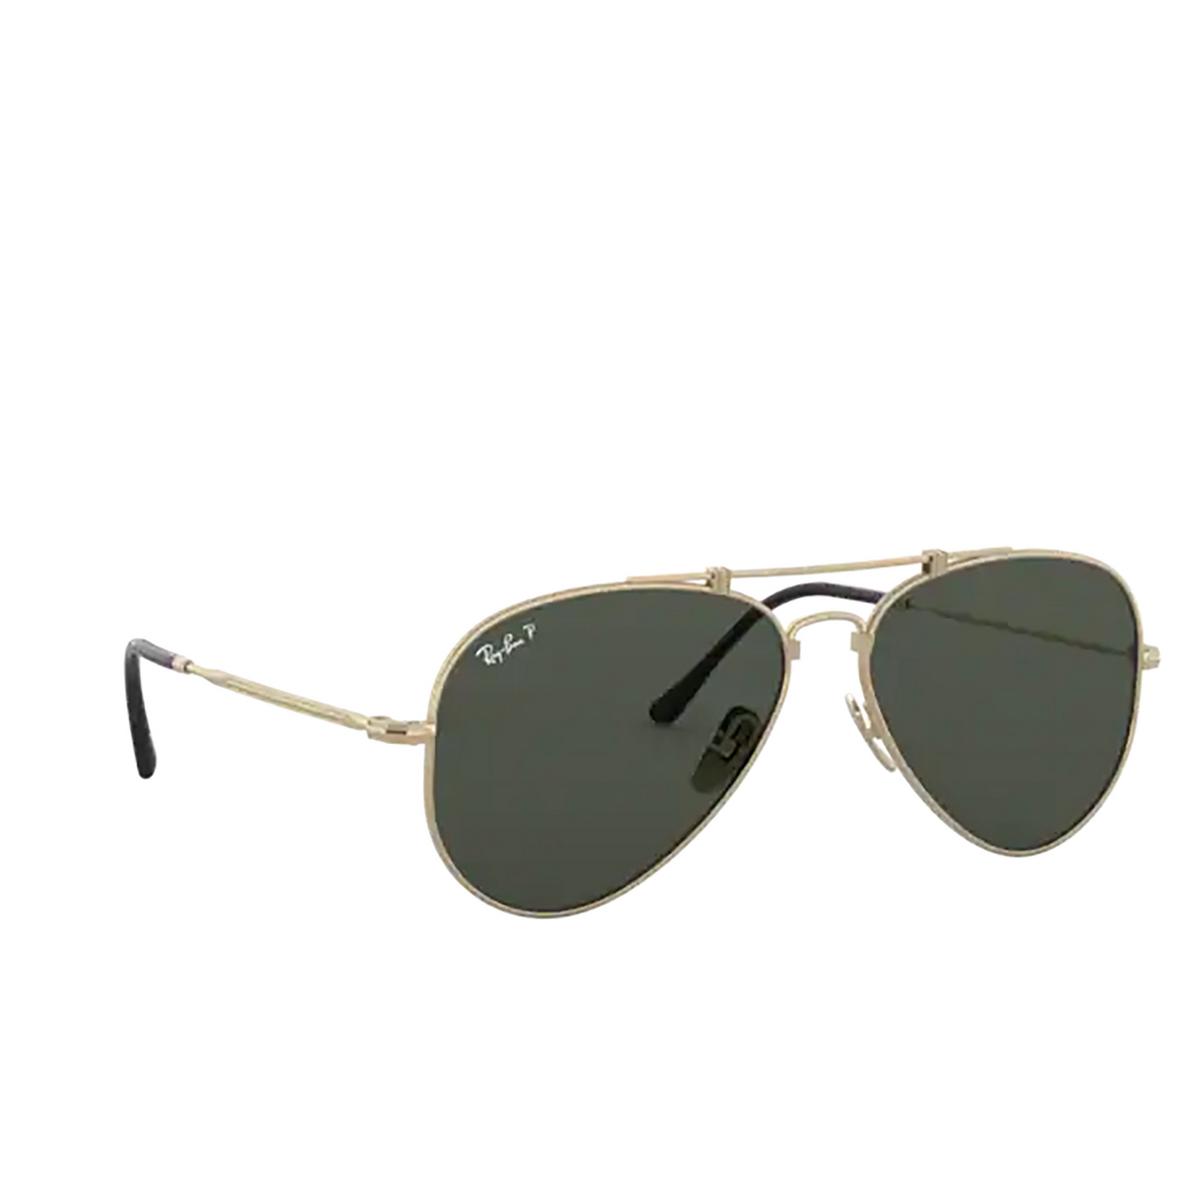 Ray-Ban® Aviator Sunglasses: Titanium RB8125M color Demi Gloss White Gold 9143 - 2/3.